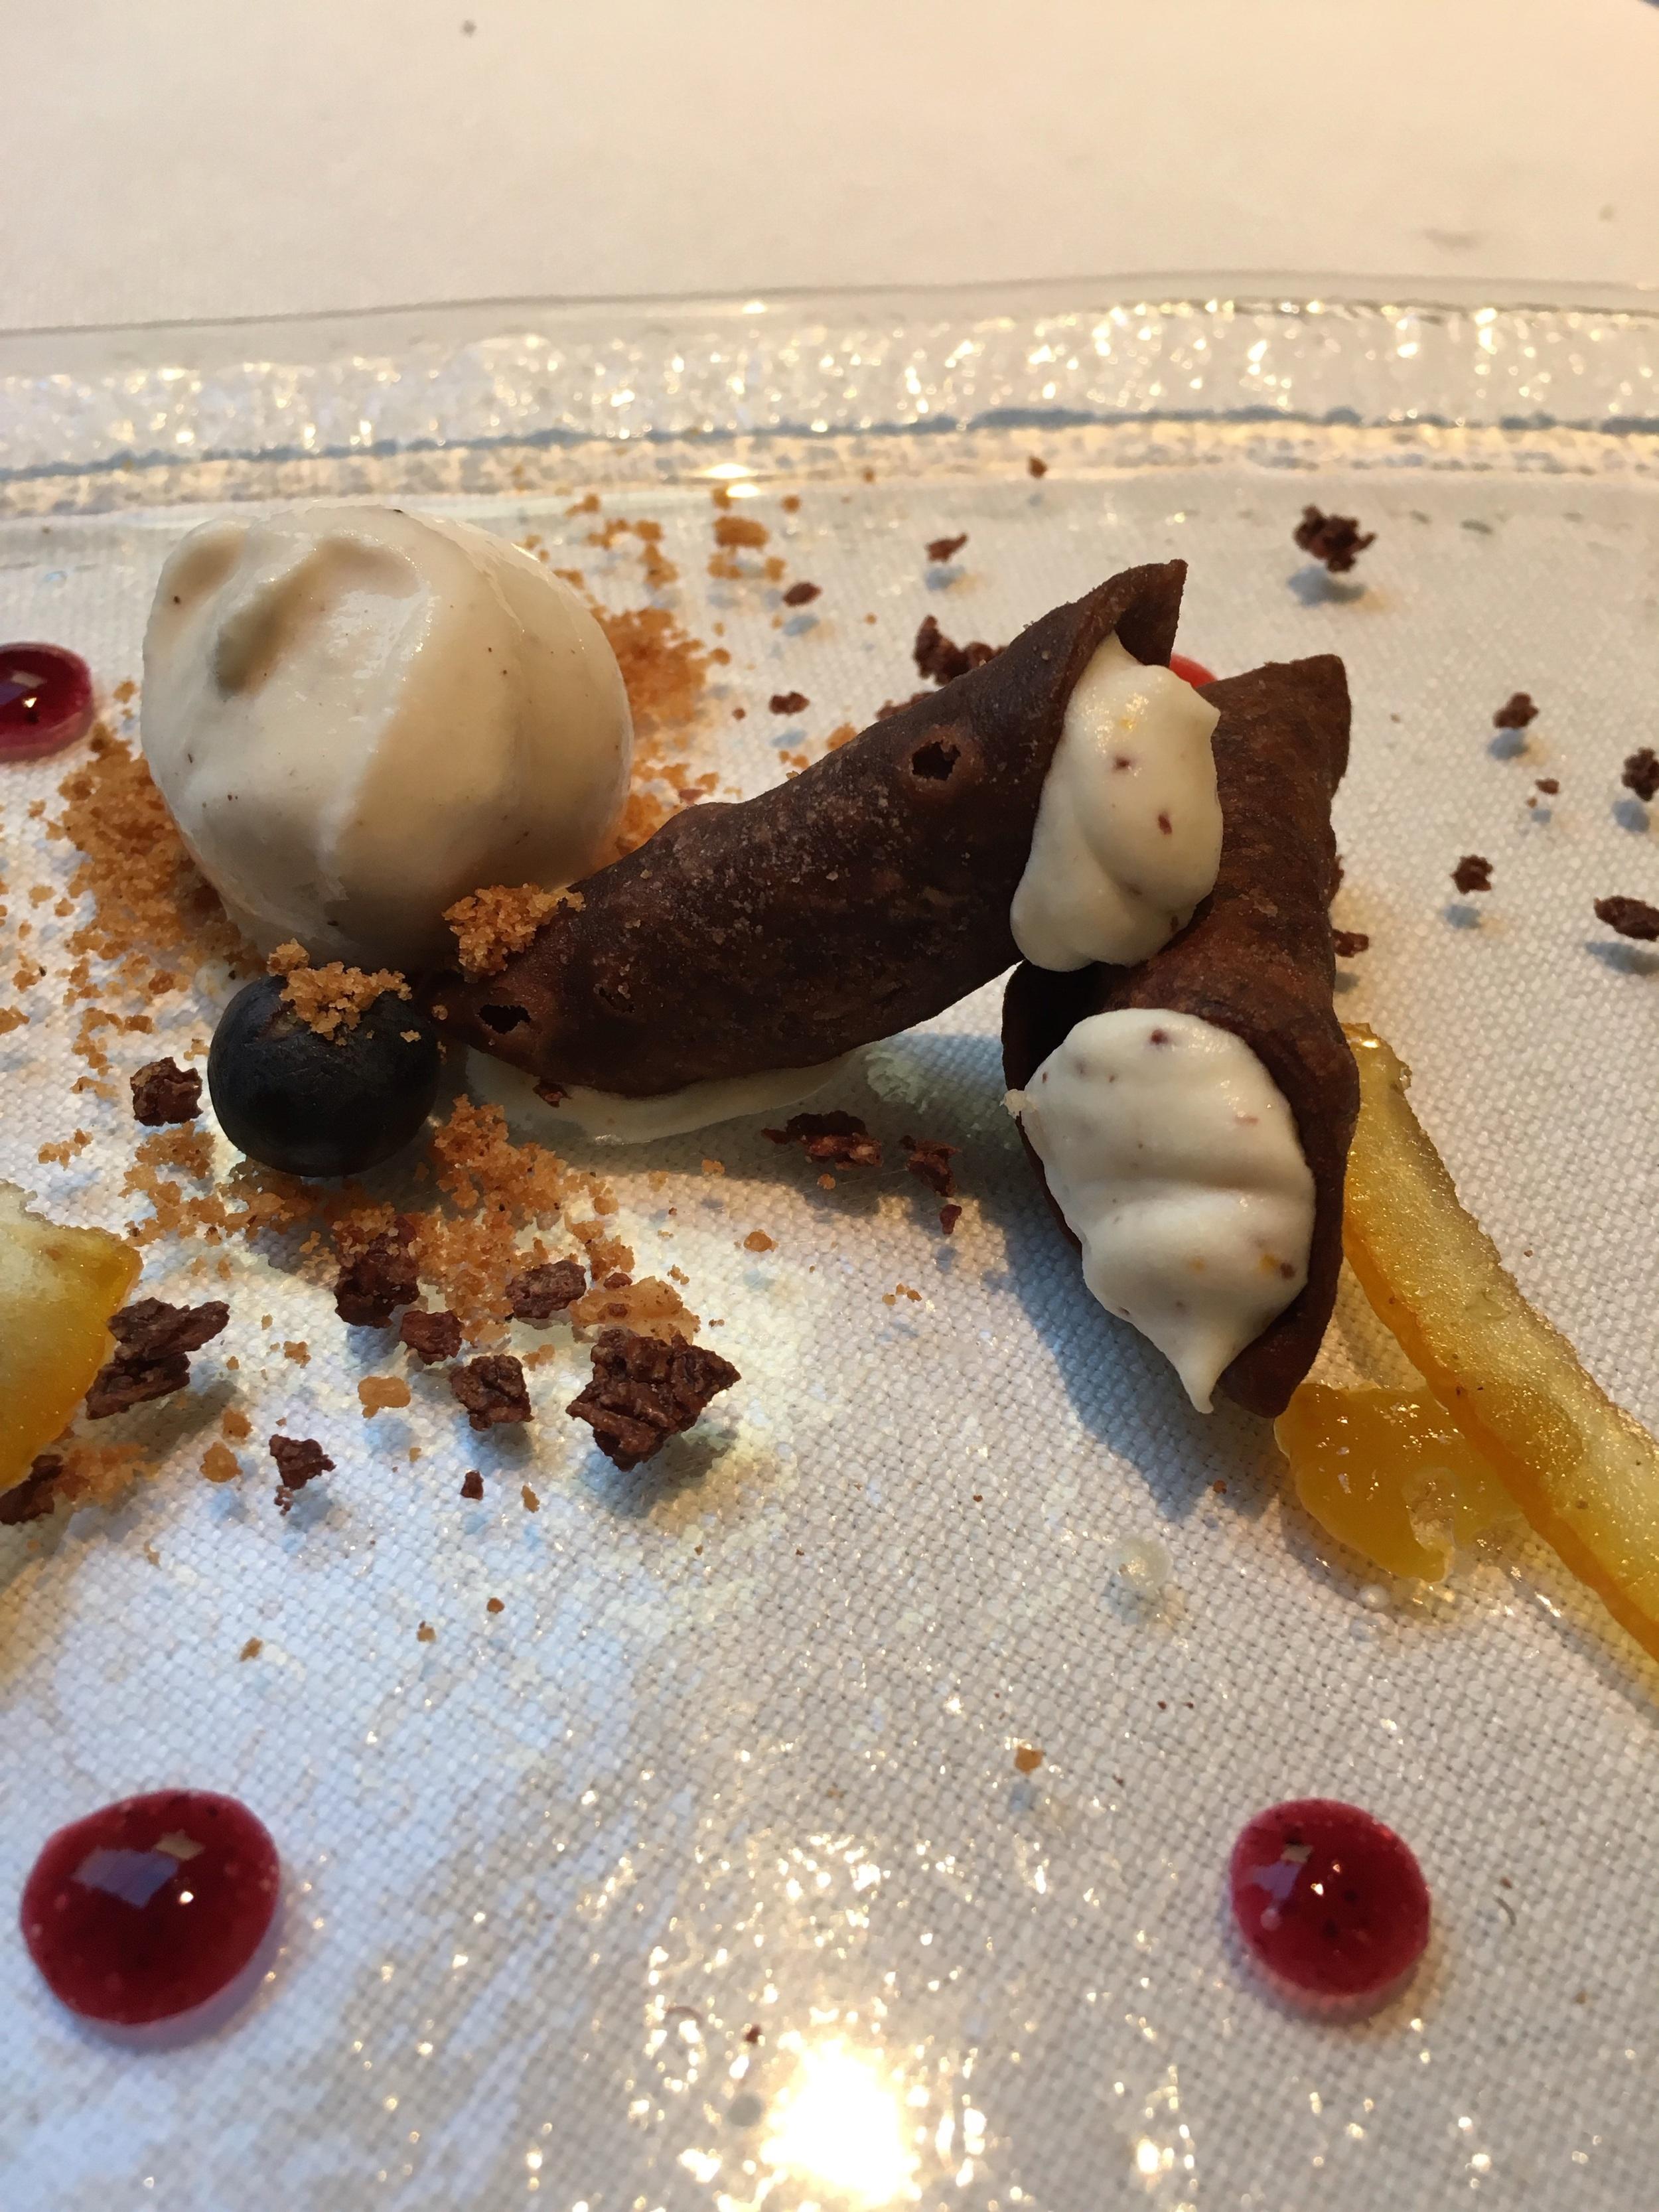 I chose Dessert #2, Cannoli